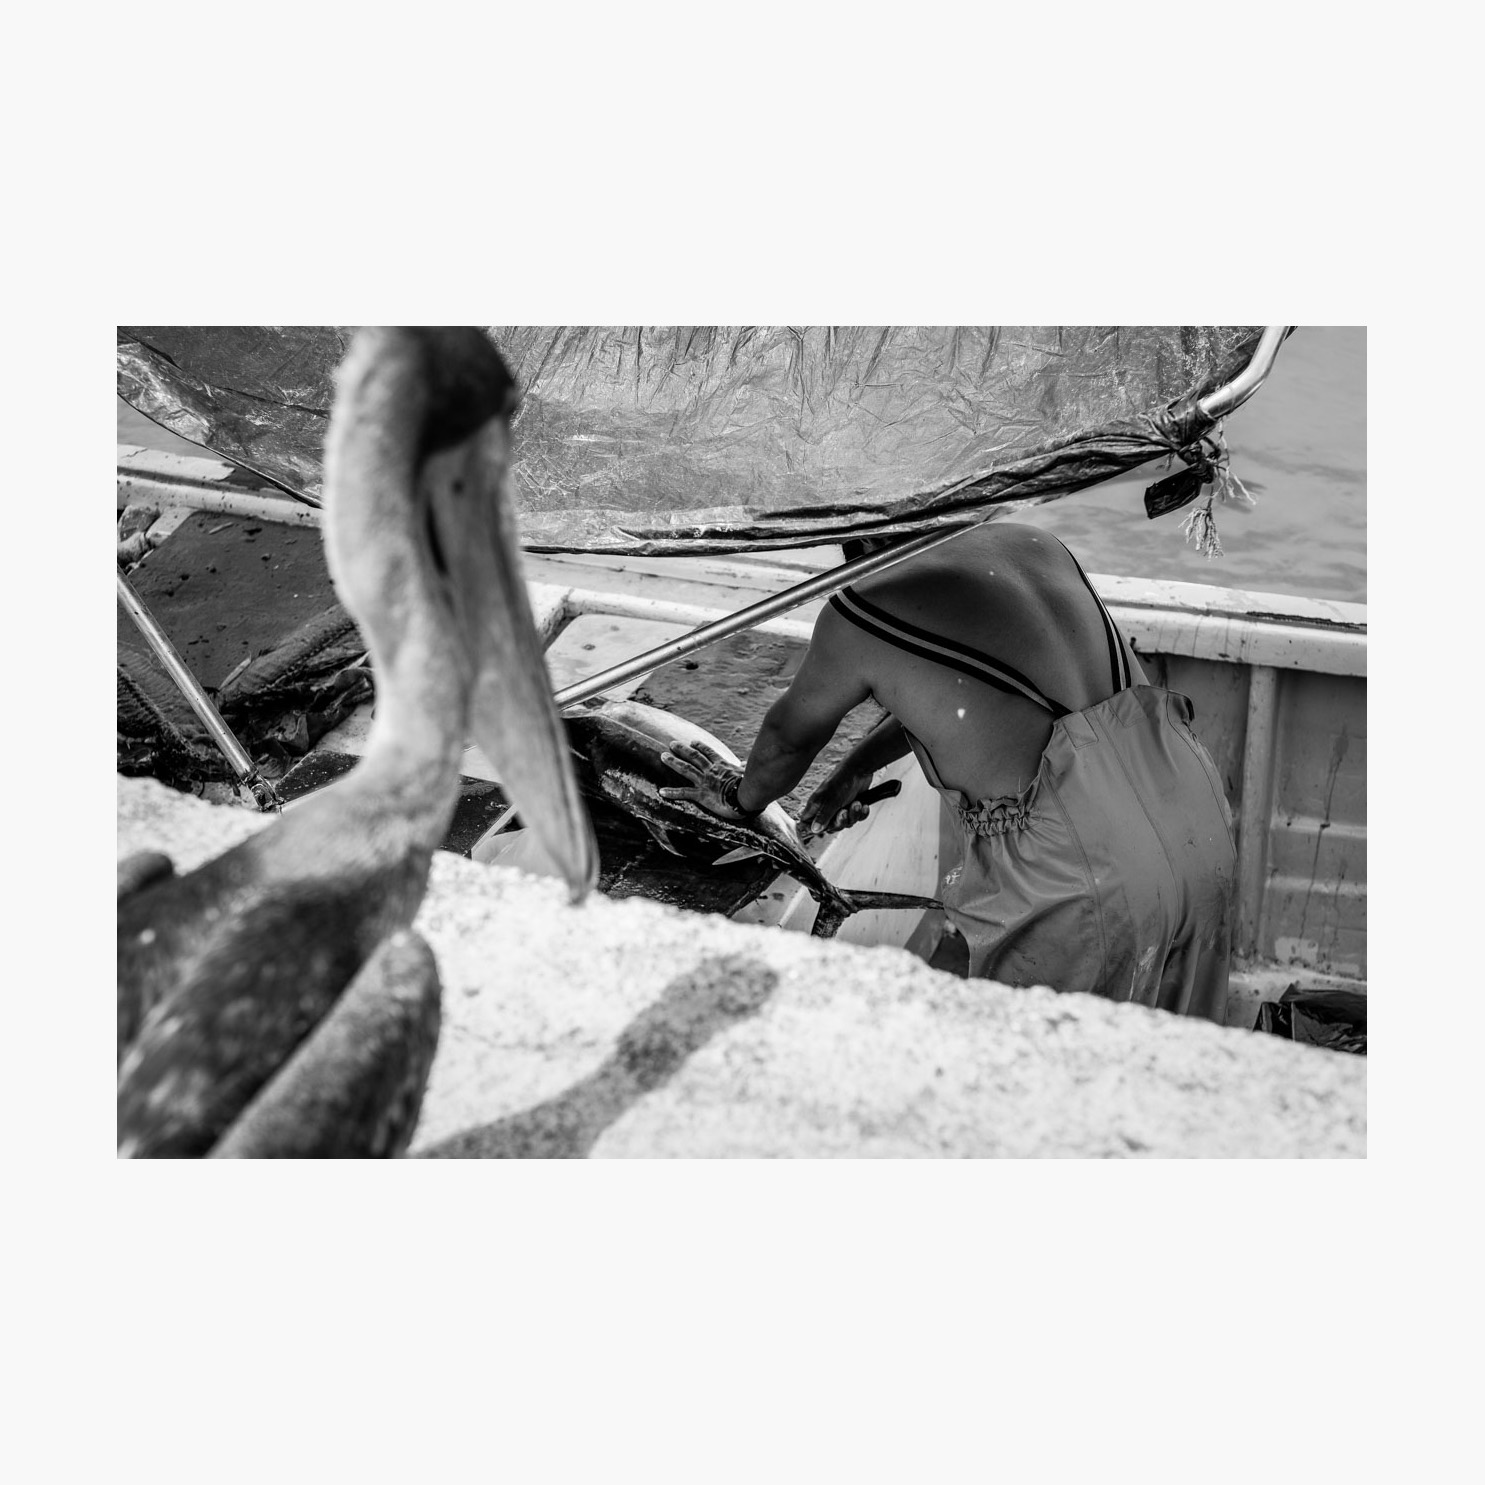 ©-2018-Harry-W-Edmonds-London-Photographers-Note-11-The-Fishermen-PN02.jpg